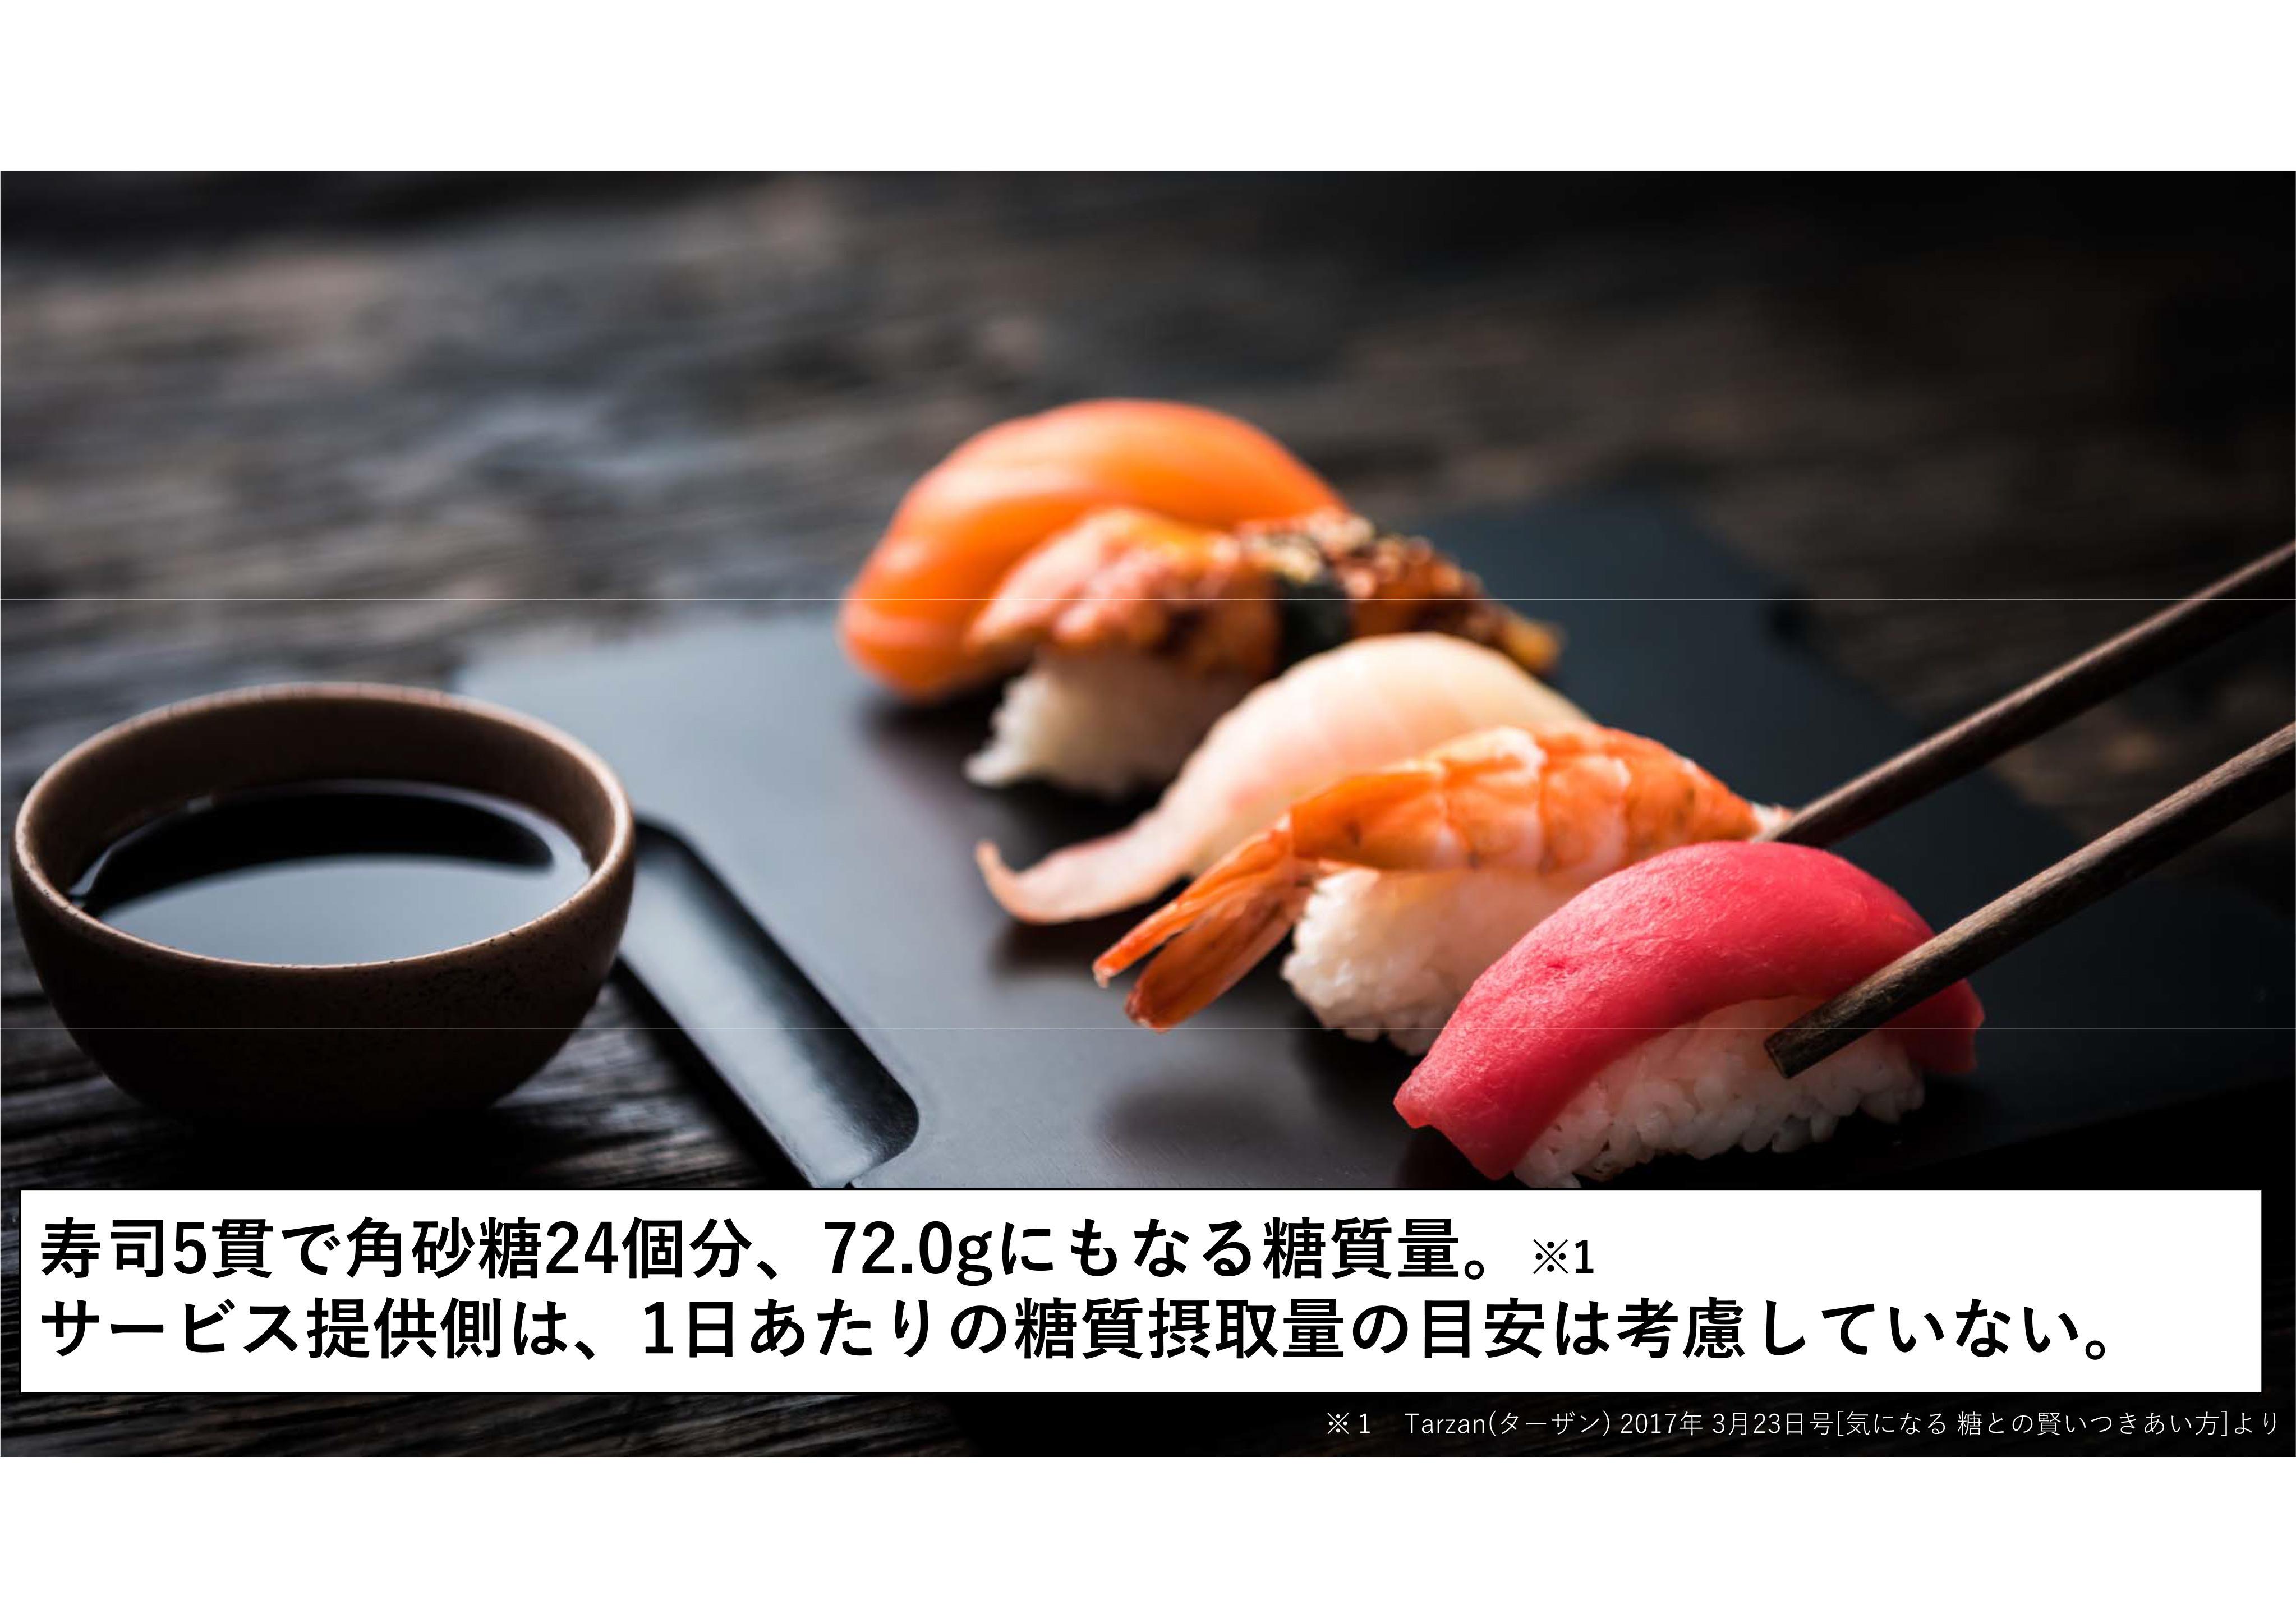 http://blogs.itmedia.co.jp/yasusasaki/0e201bfecf6d662f62344a4fdb4e39c8509fa12a.jpg